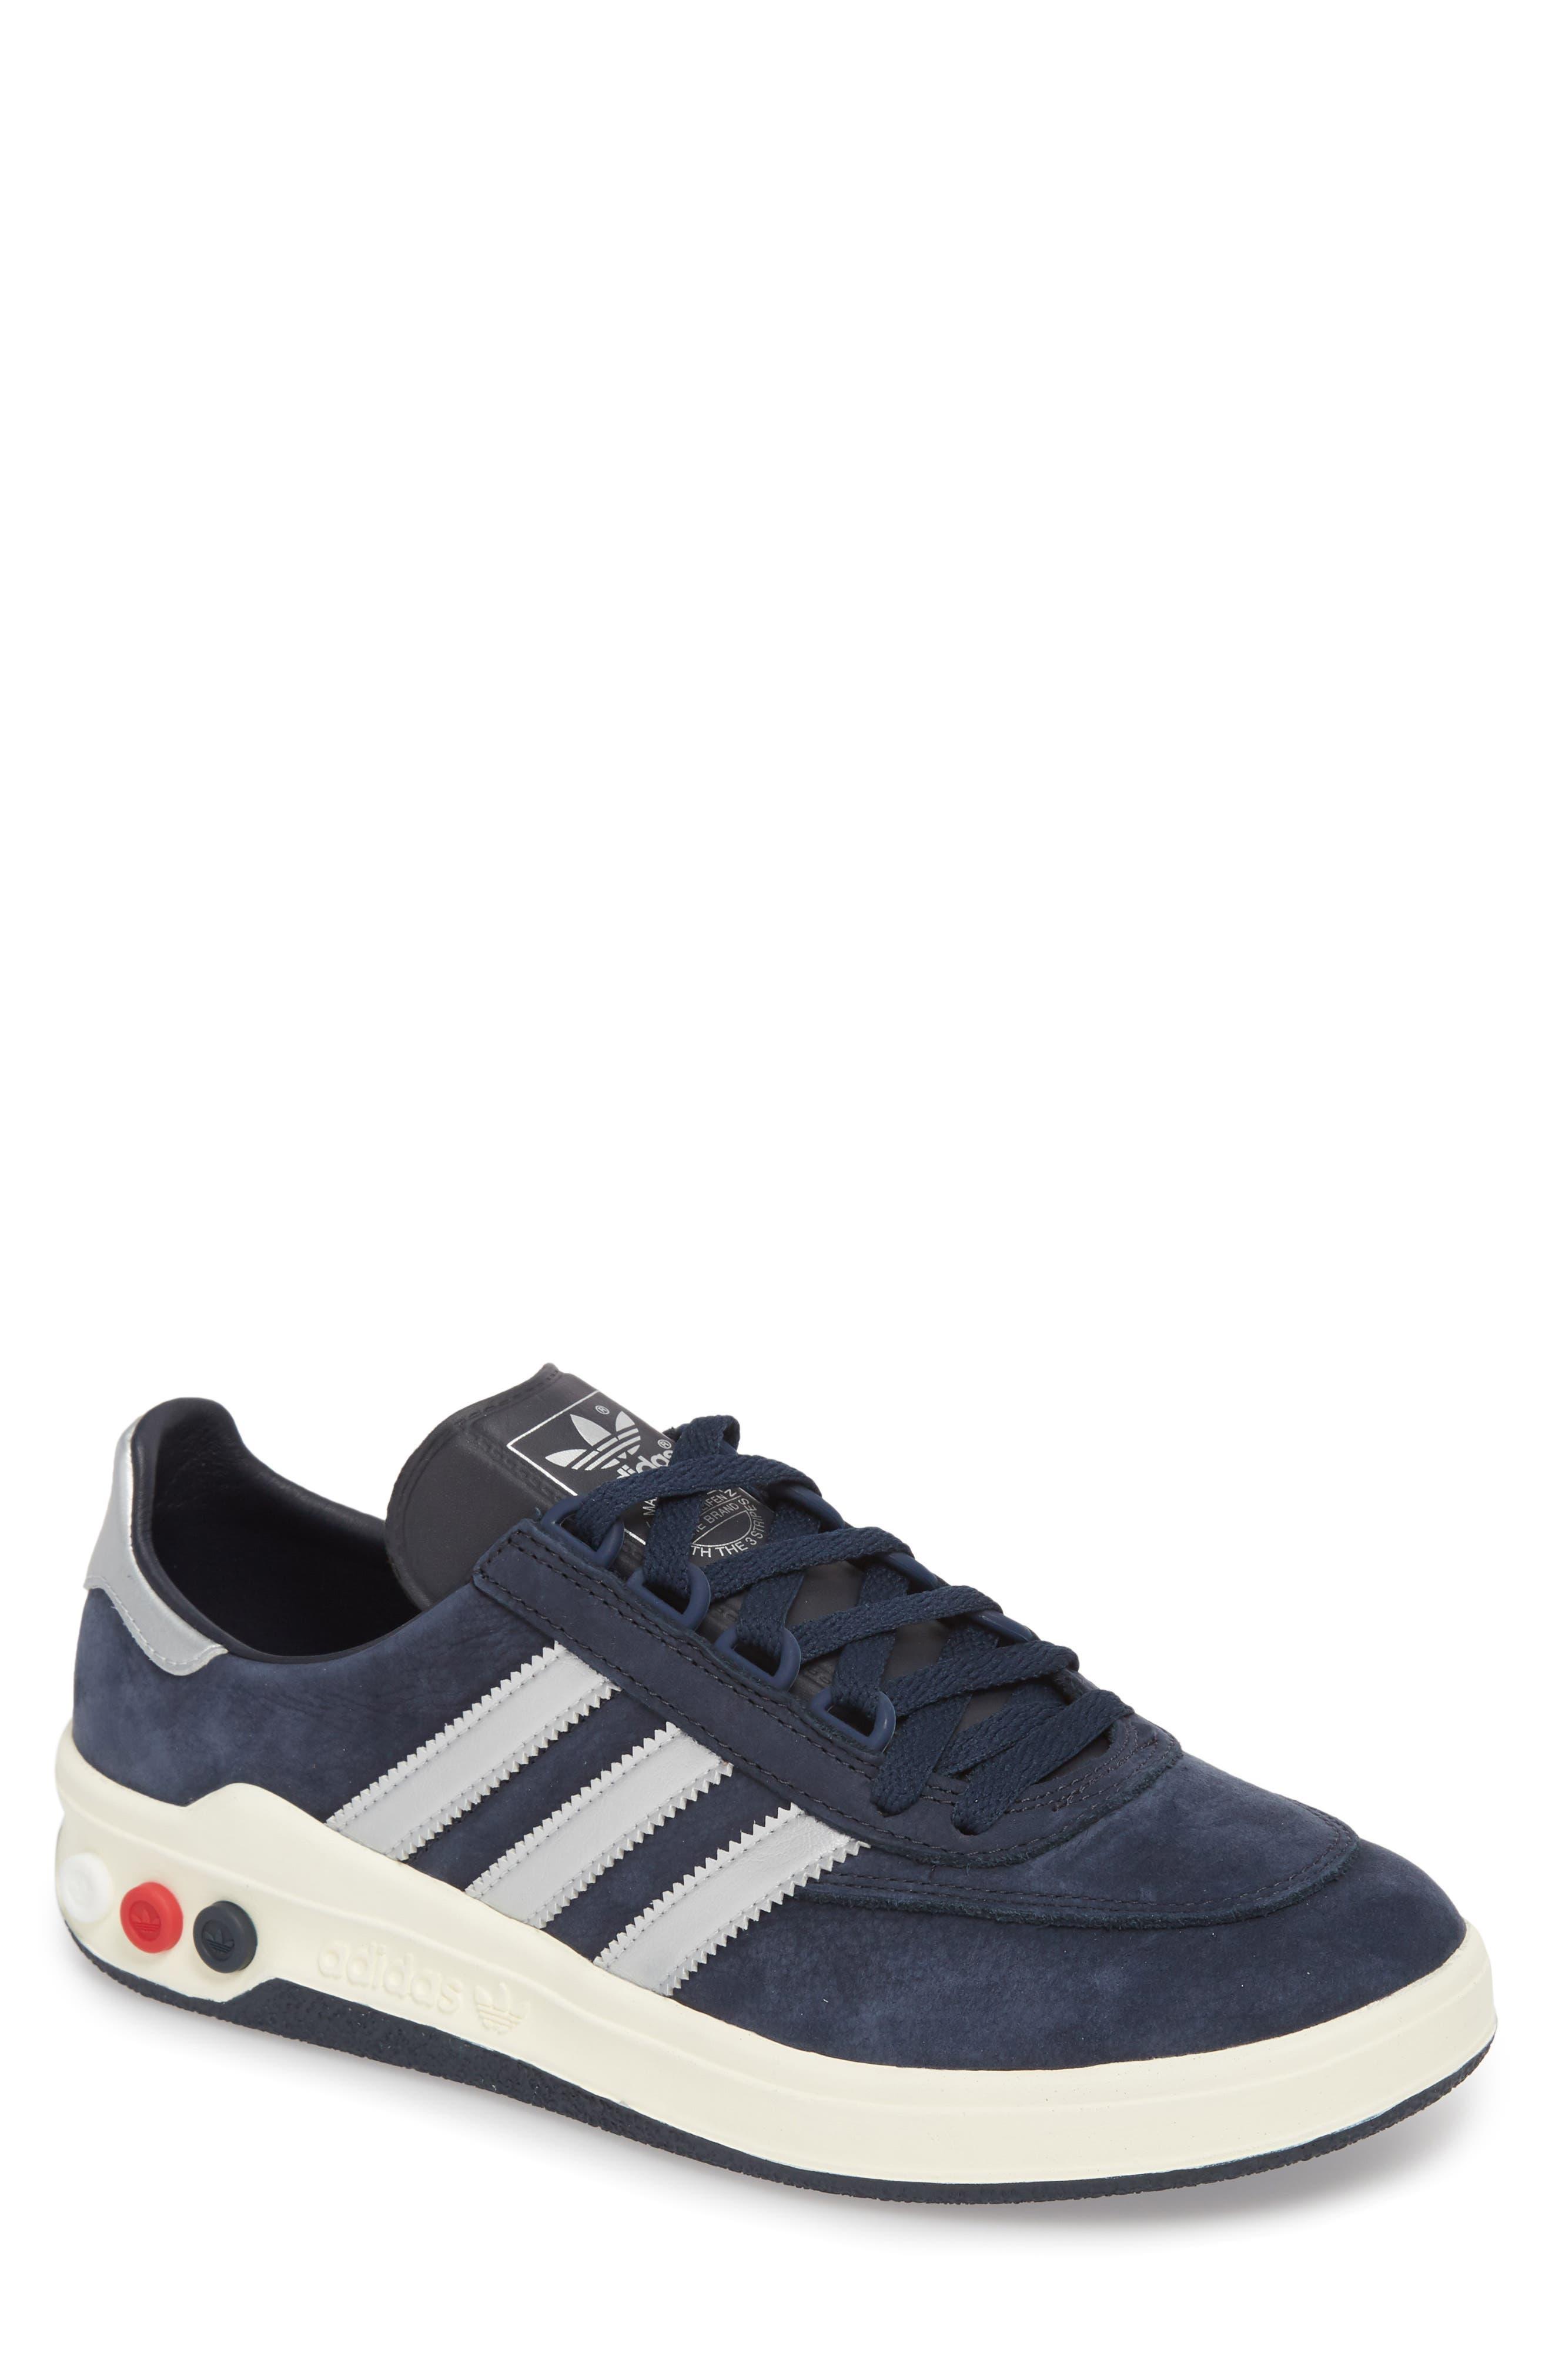 adidas CLMBA SPZL Sneaker (Men)